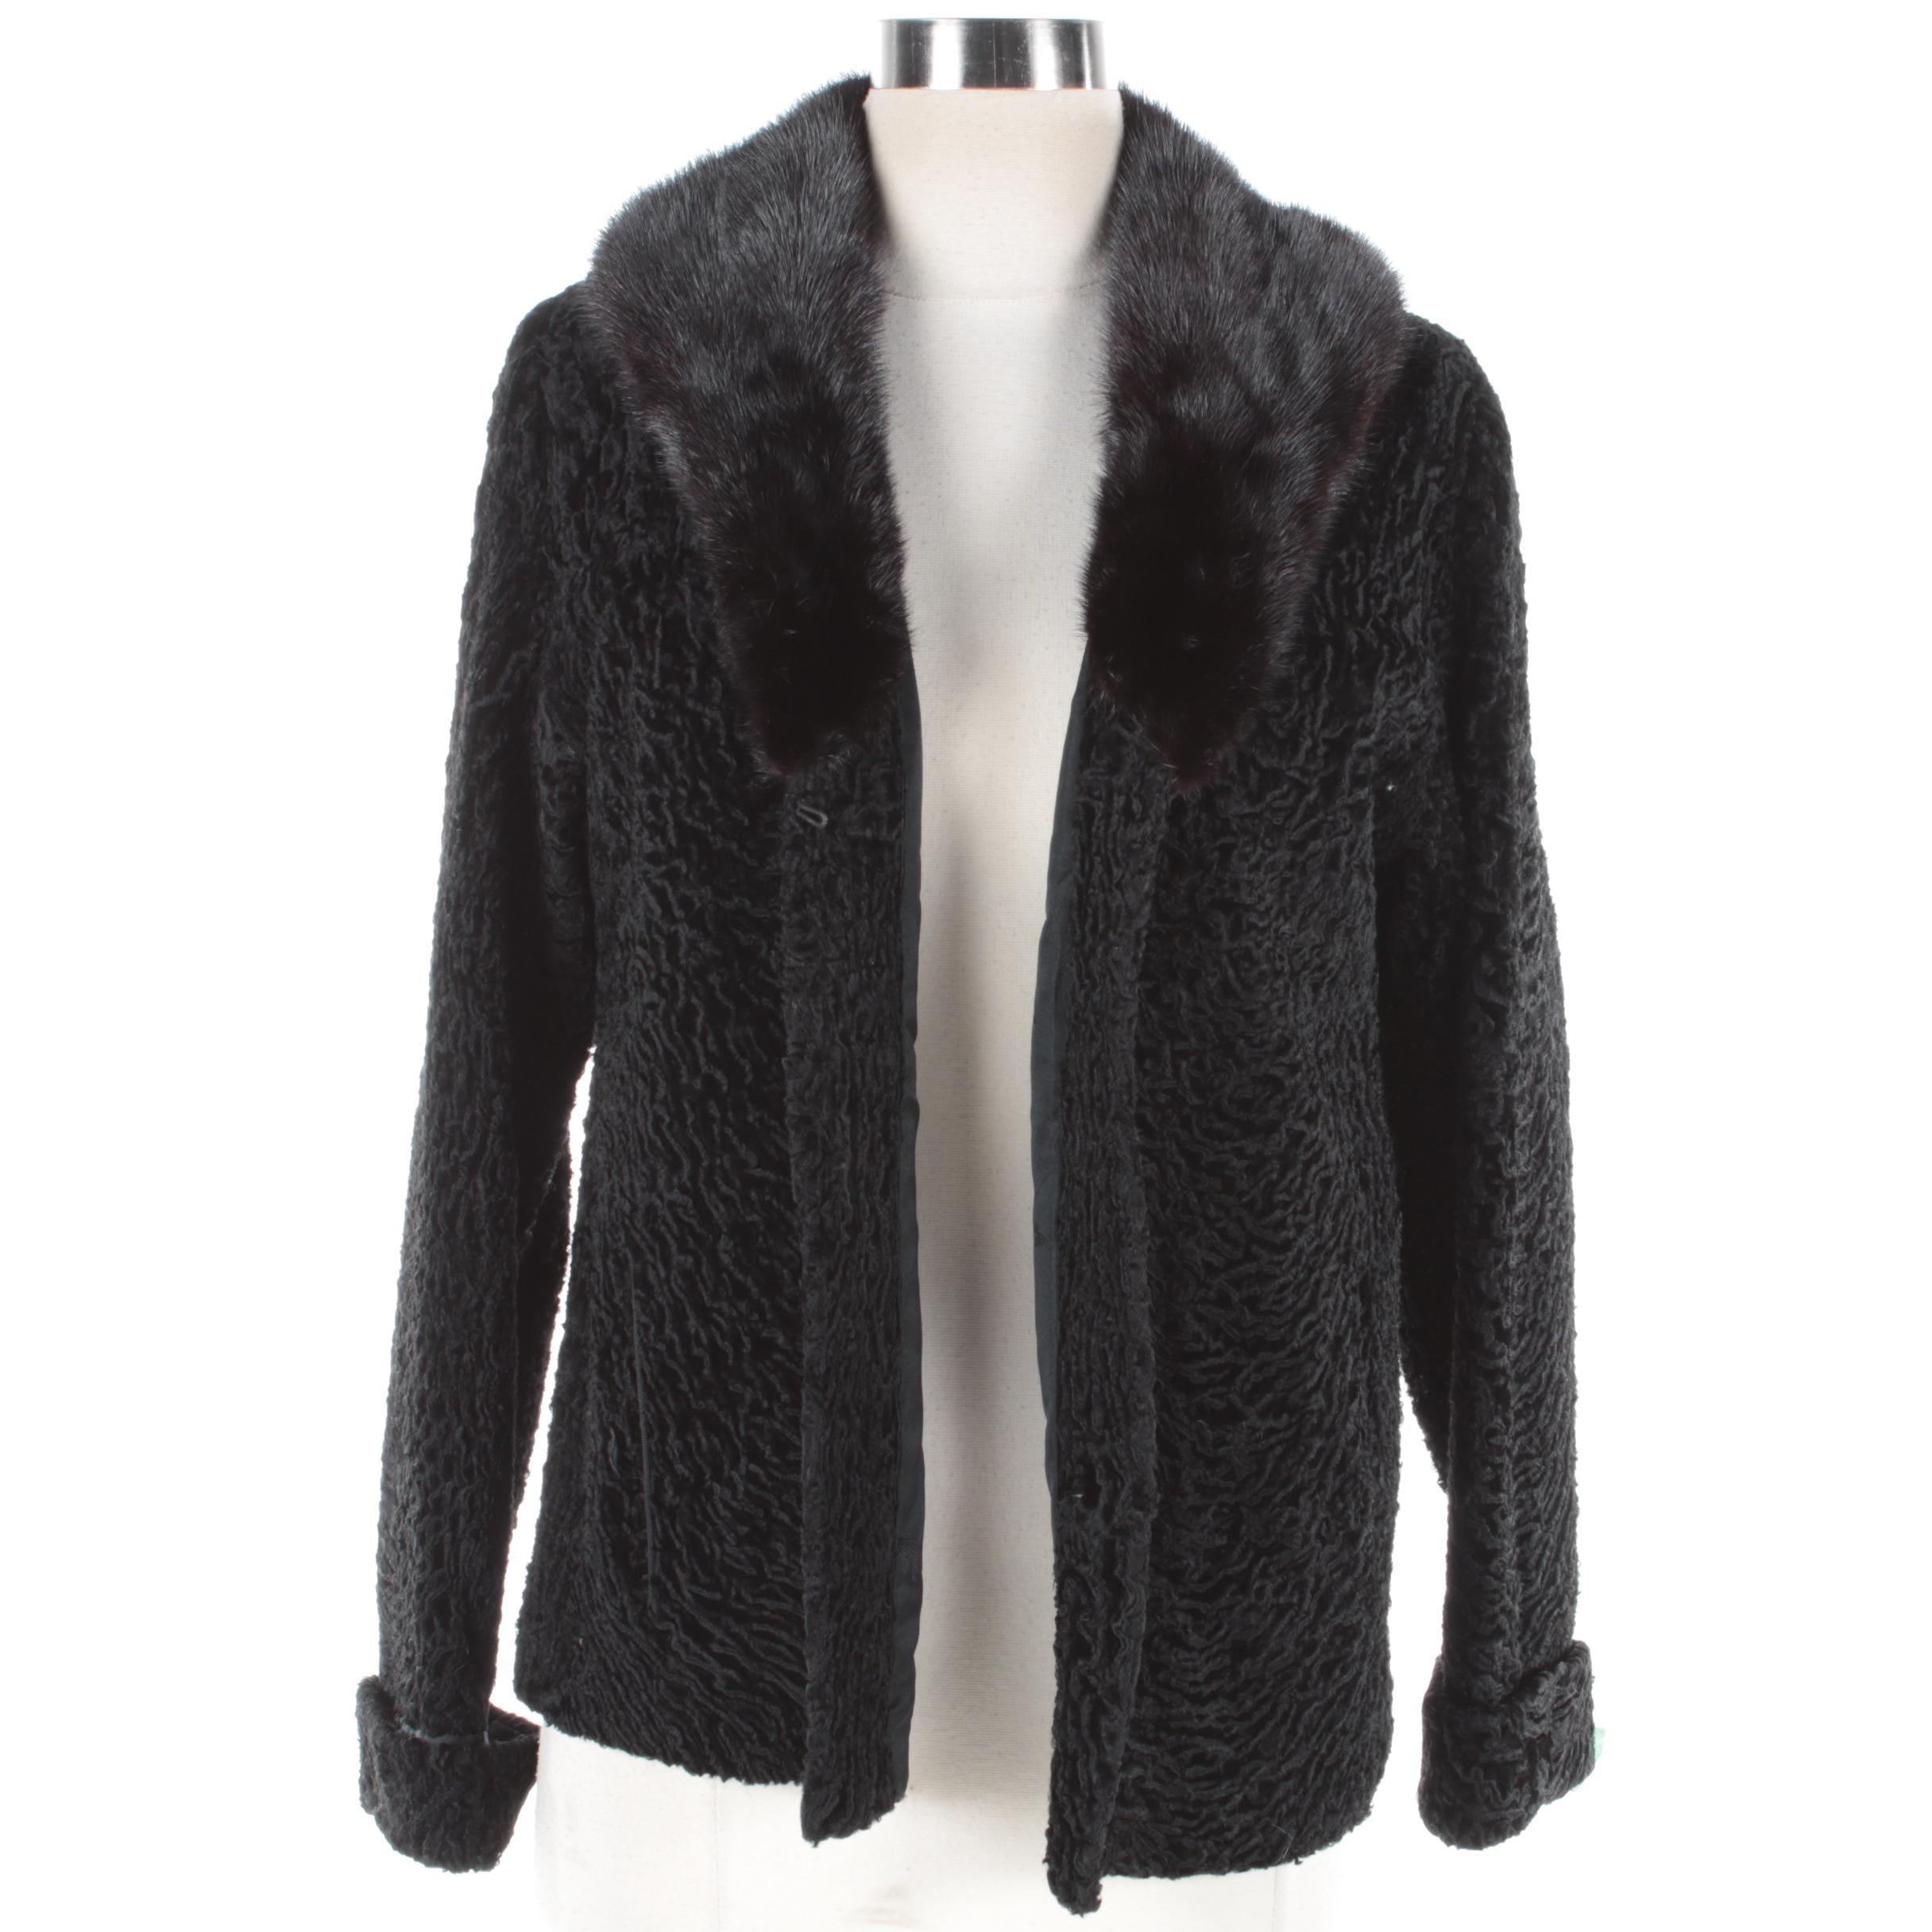 Women's Vintage Black Persian Lamb Fur Coat with Mink Fur Collar